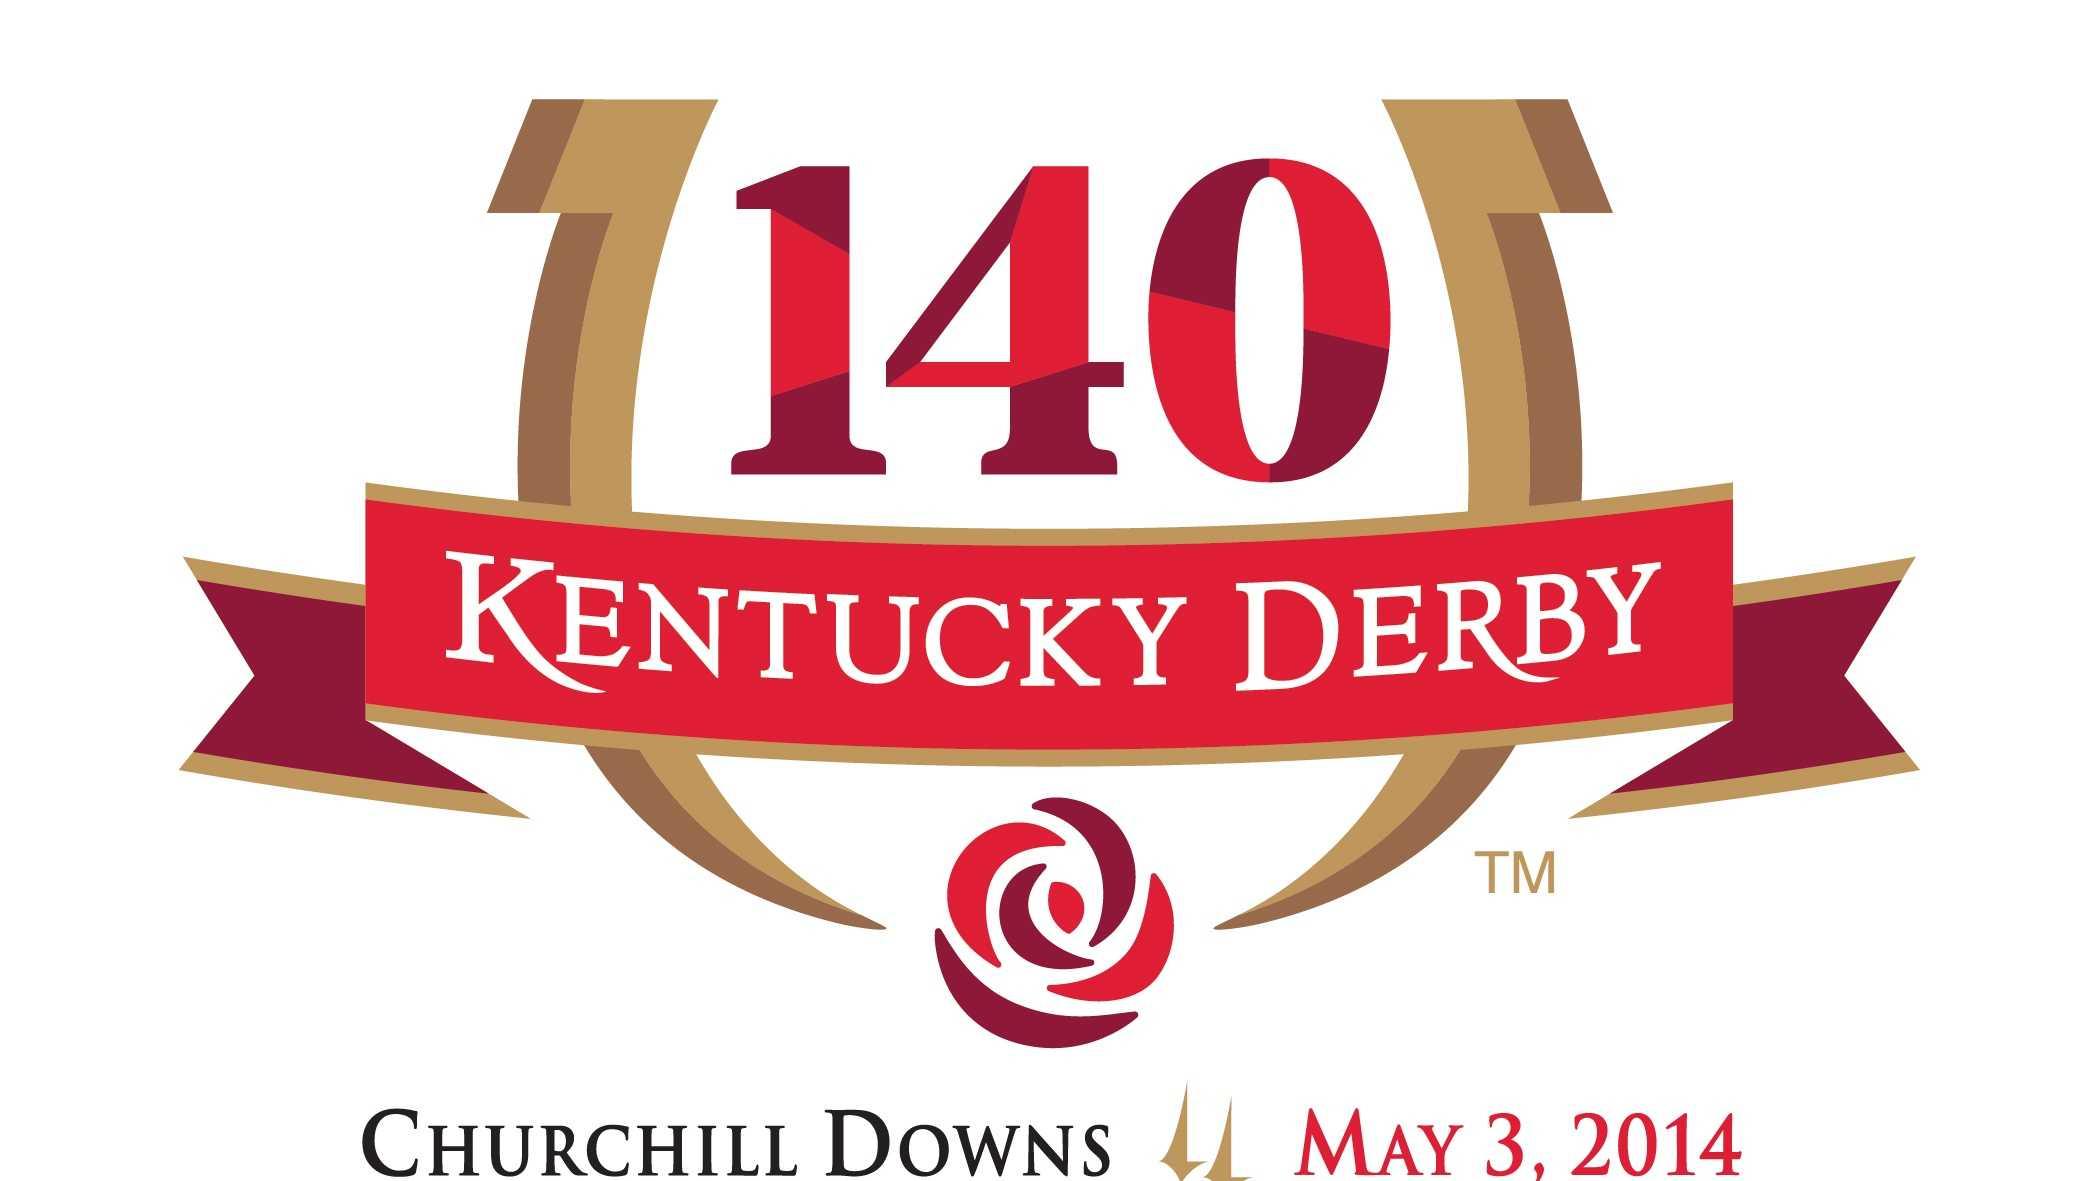 Kentucky Derby 140